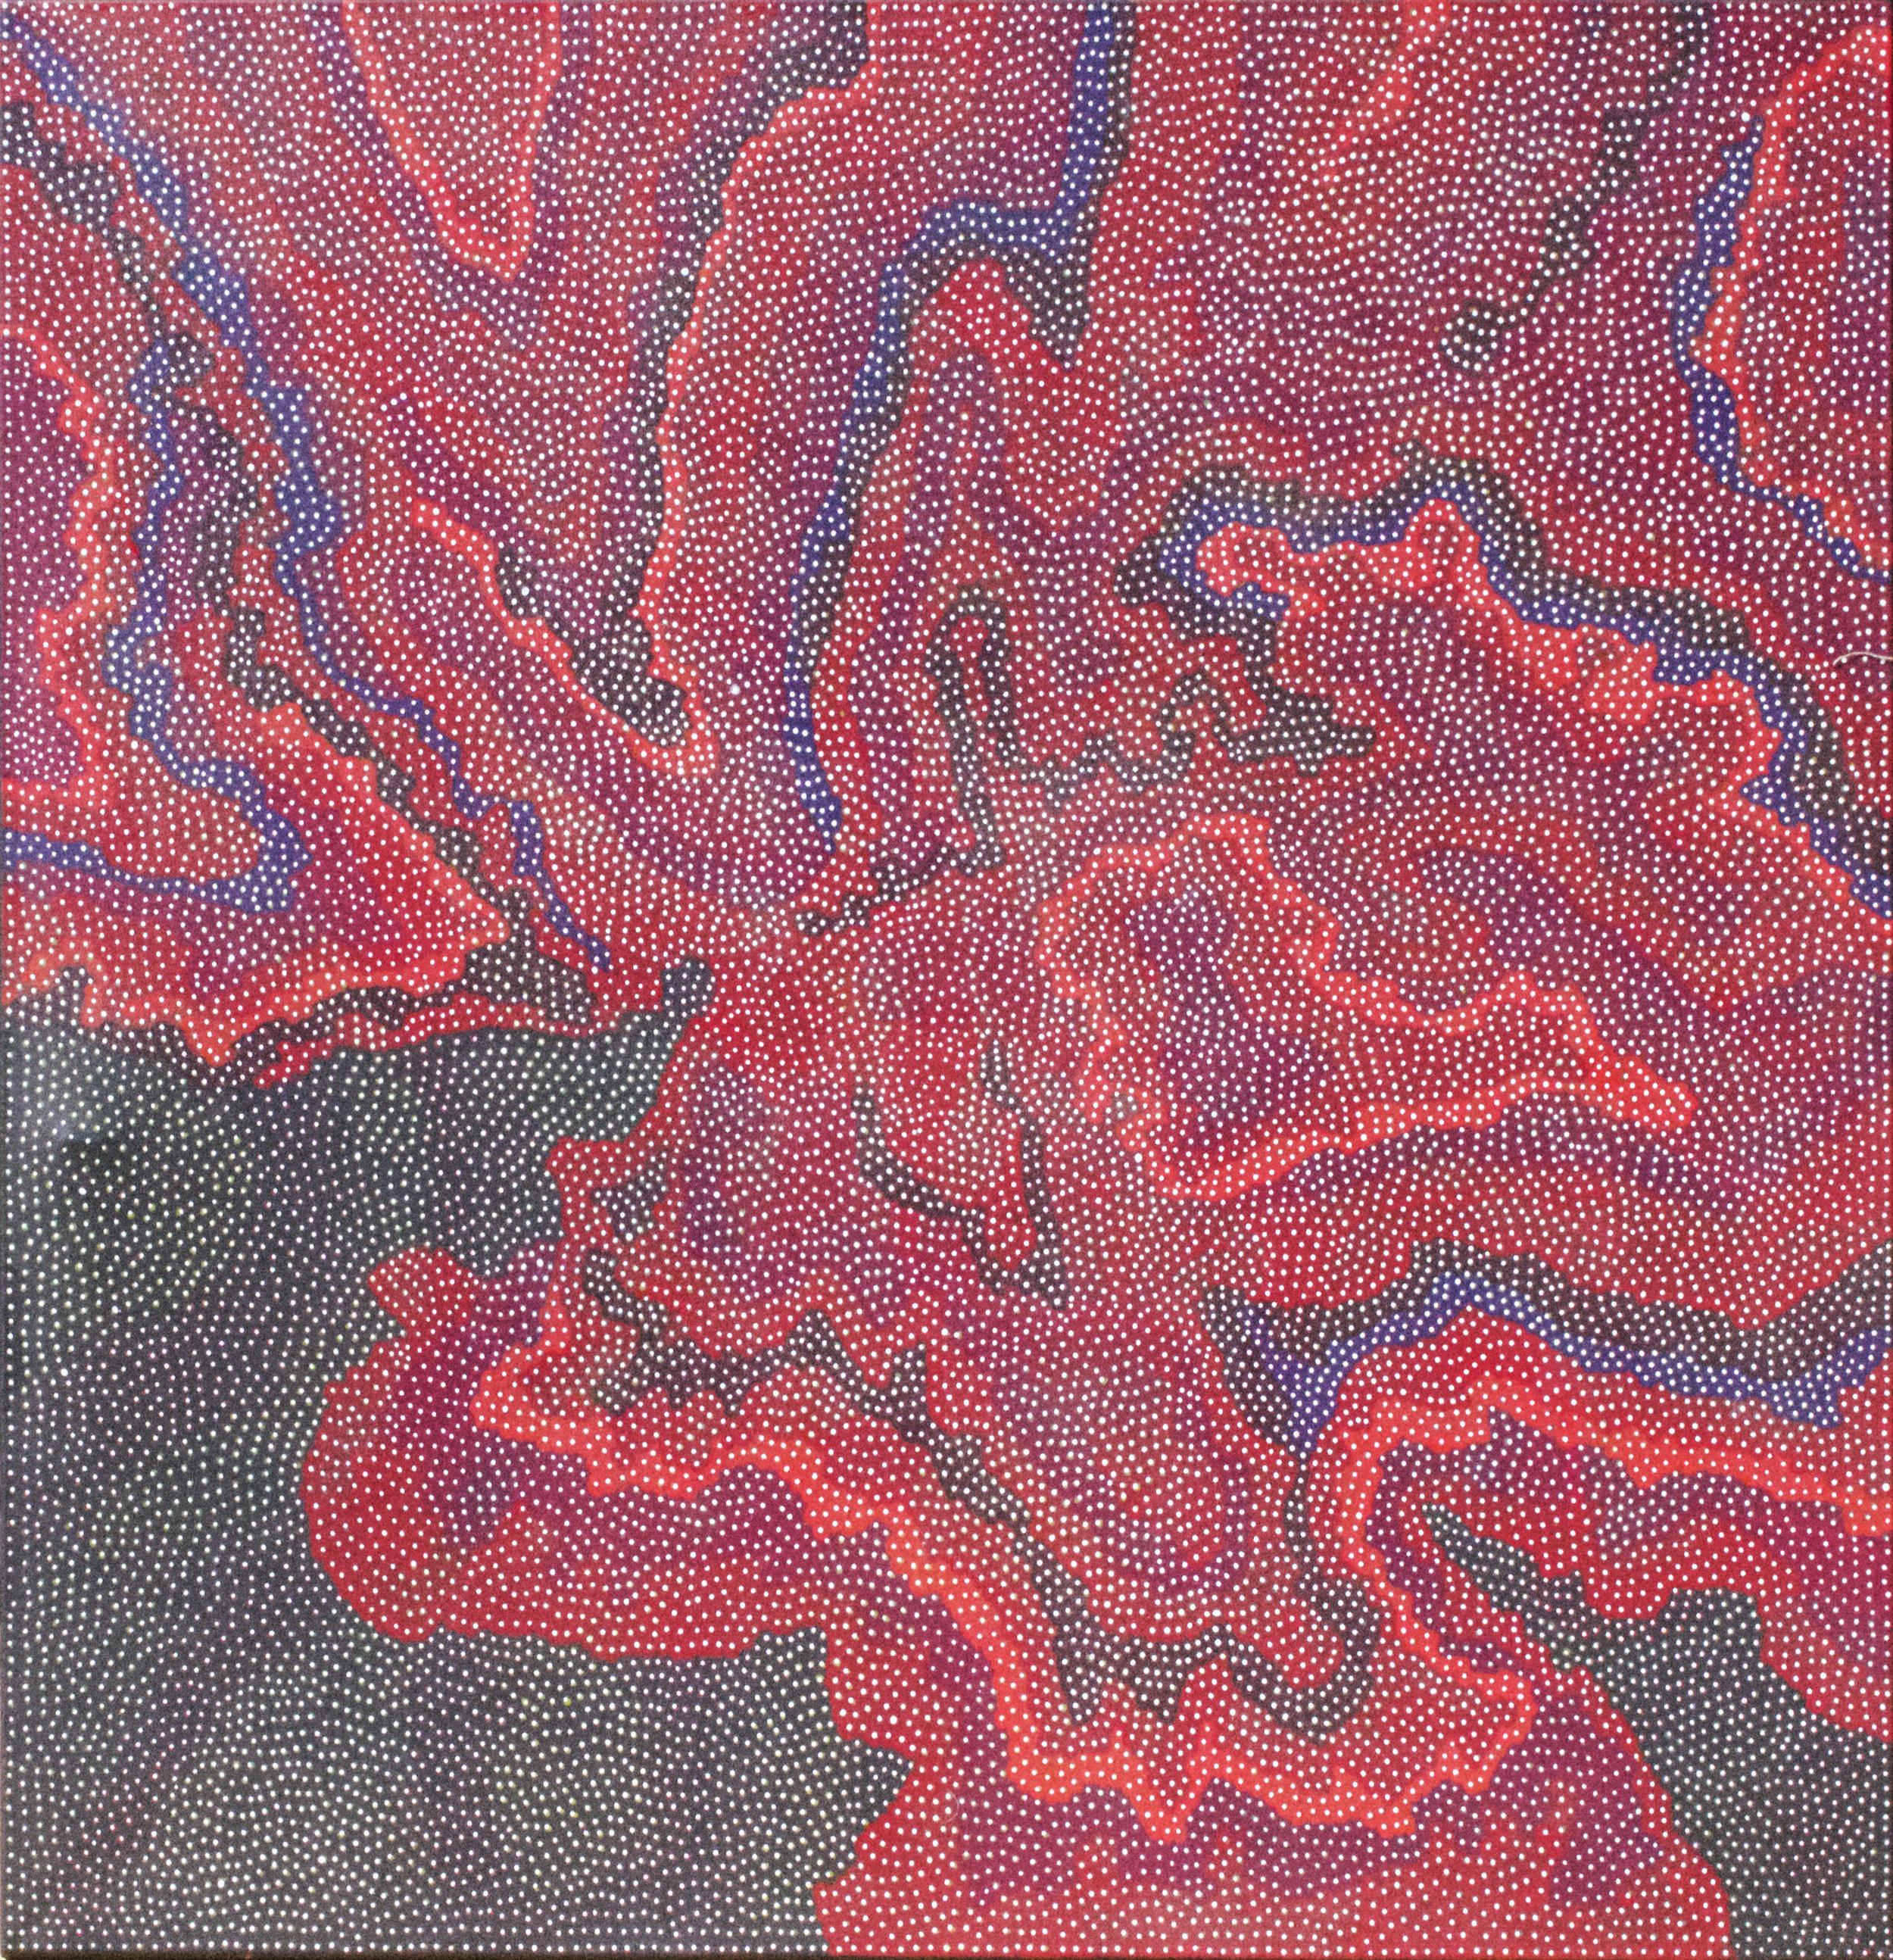 "Robert Fielding Punnagka  Kunkarangkanypa Tjukurpa (Seven Sisters)  Acrylic on linen 59"" x 59"" (150 x 150 cm) Mimili Maku Arts Catalog #522-15   Price Available upon Request"